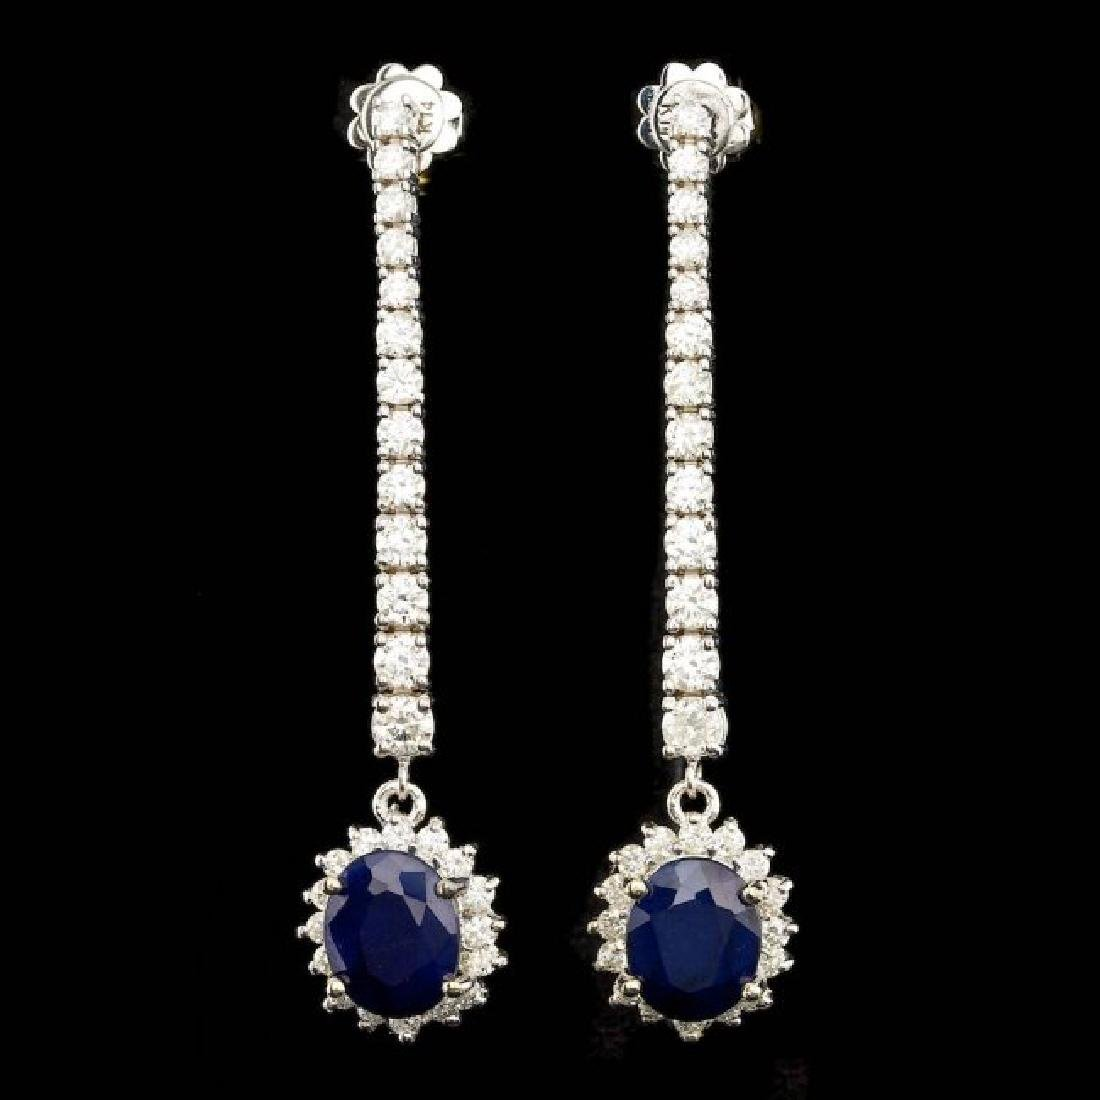 14k Gold 6.00ct Sapphire 2.90ct Diamond Earrings